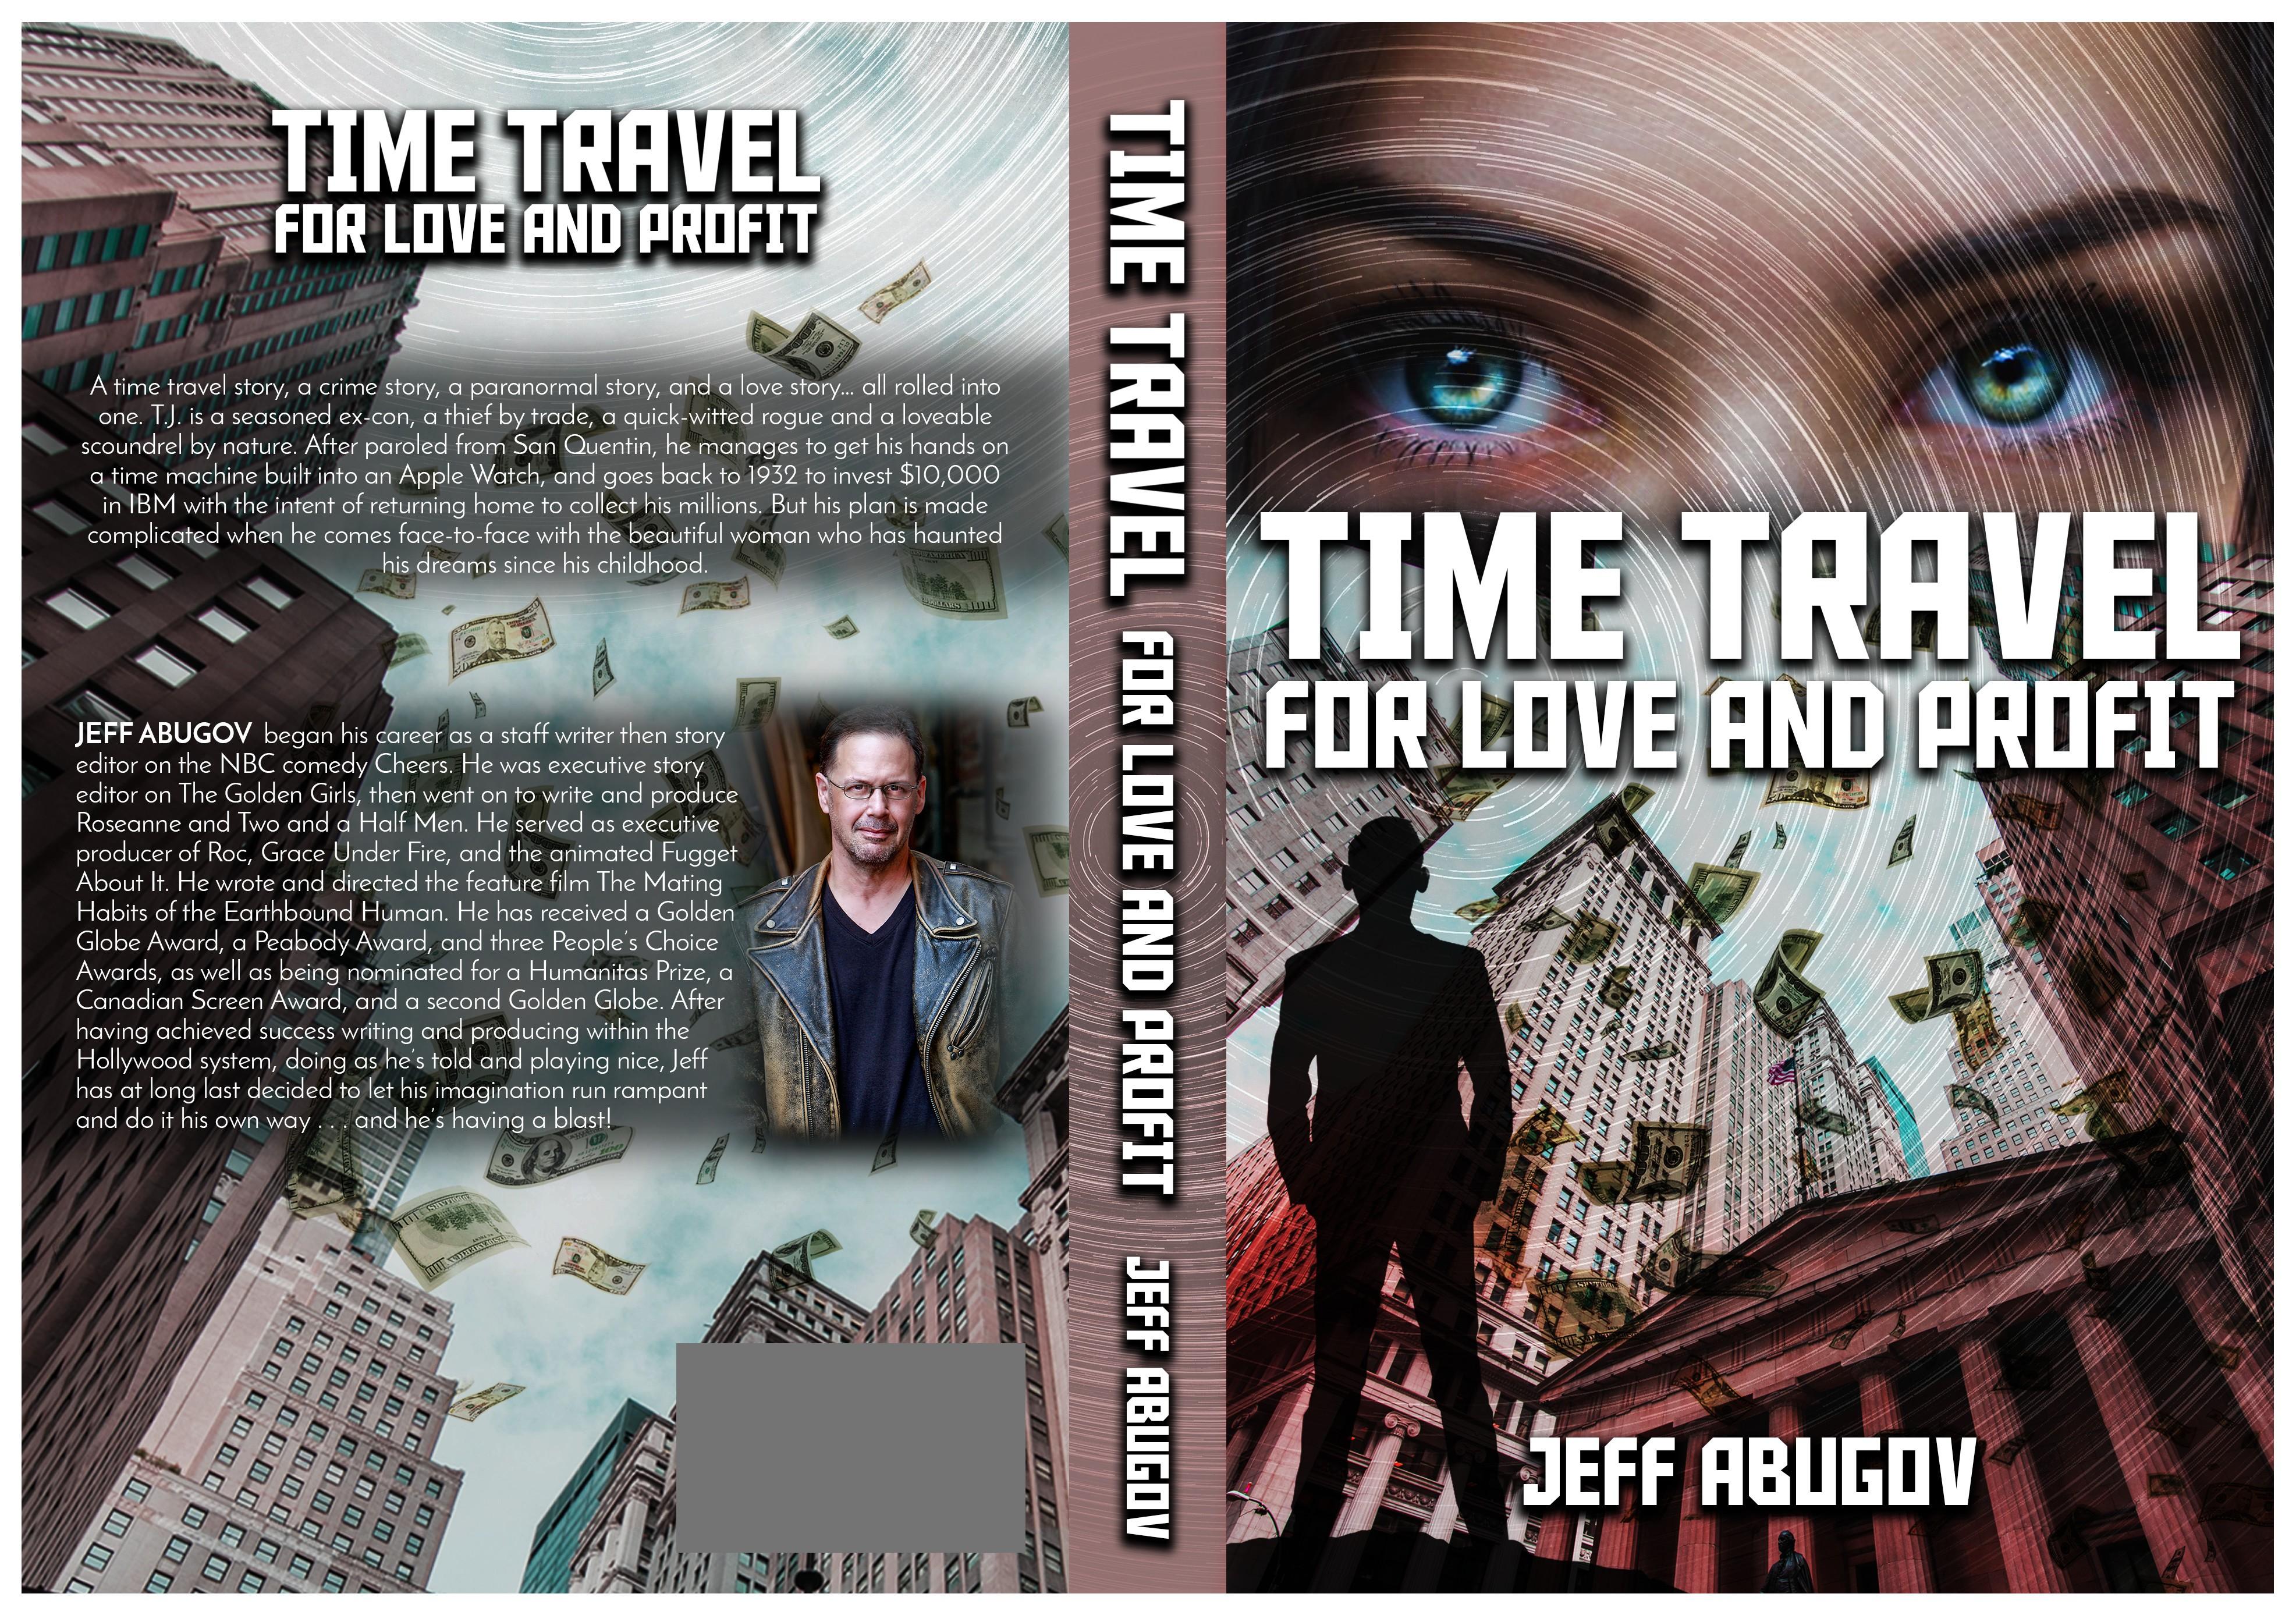 Create an awesome cover for a sci-fi-crime-romance novel!